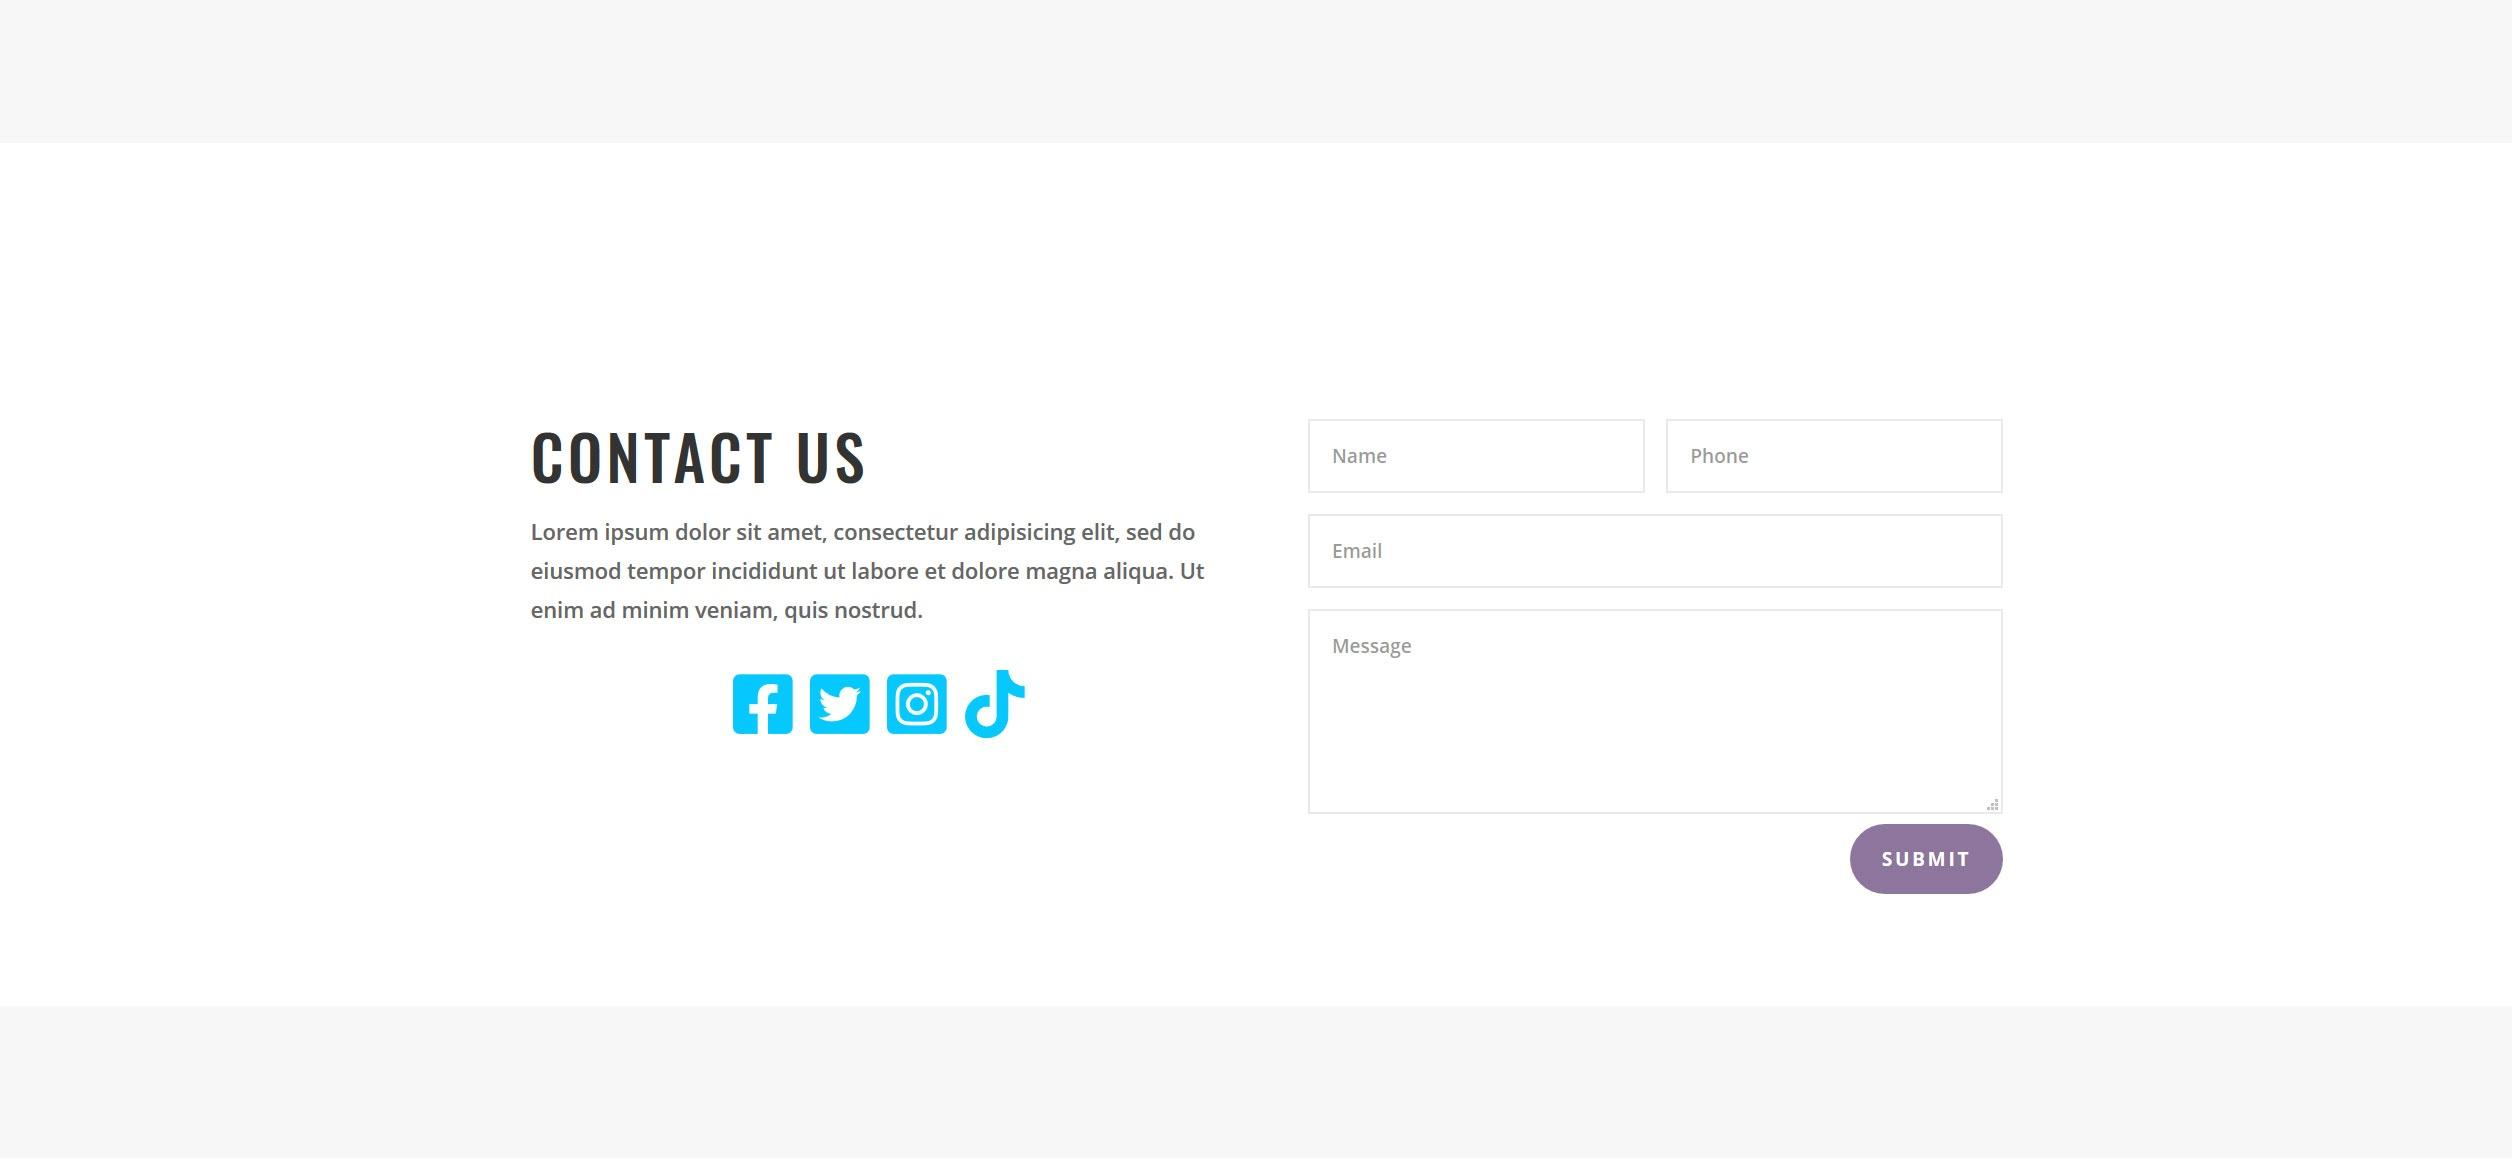 Website for Hair Braiding v1 - Contact Form & Social Media Links